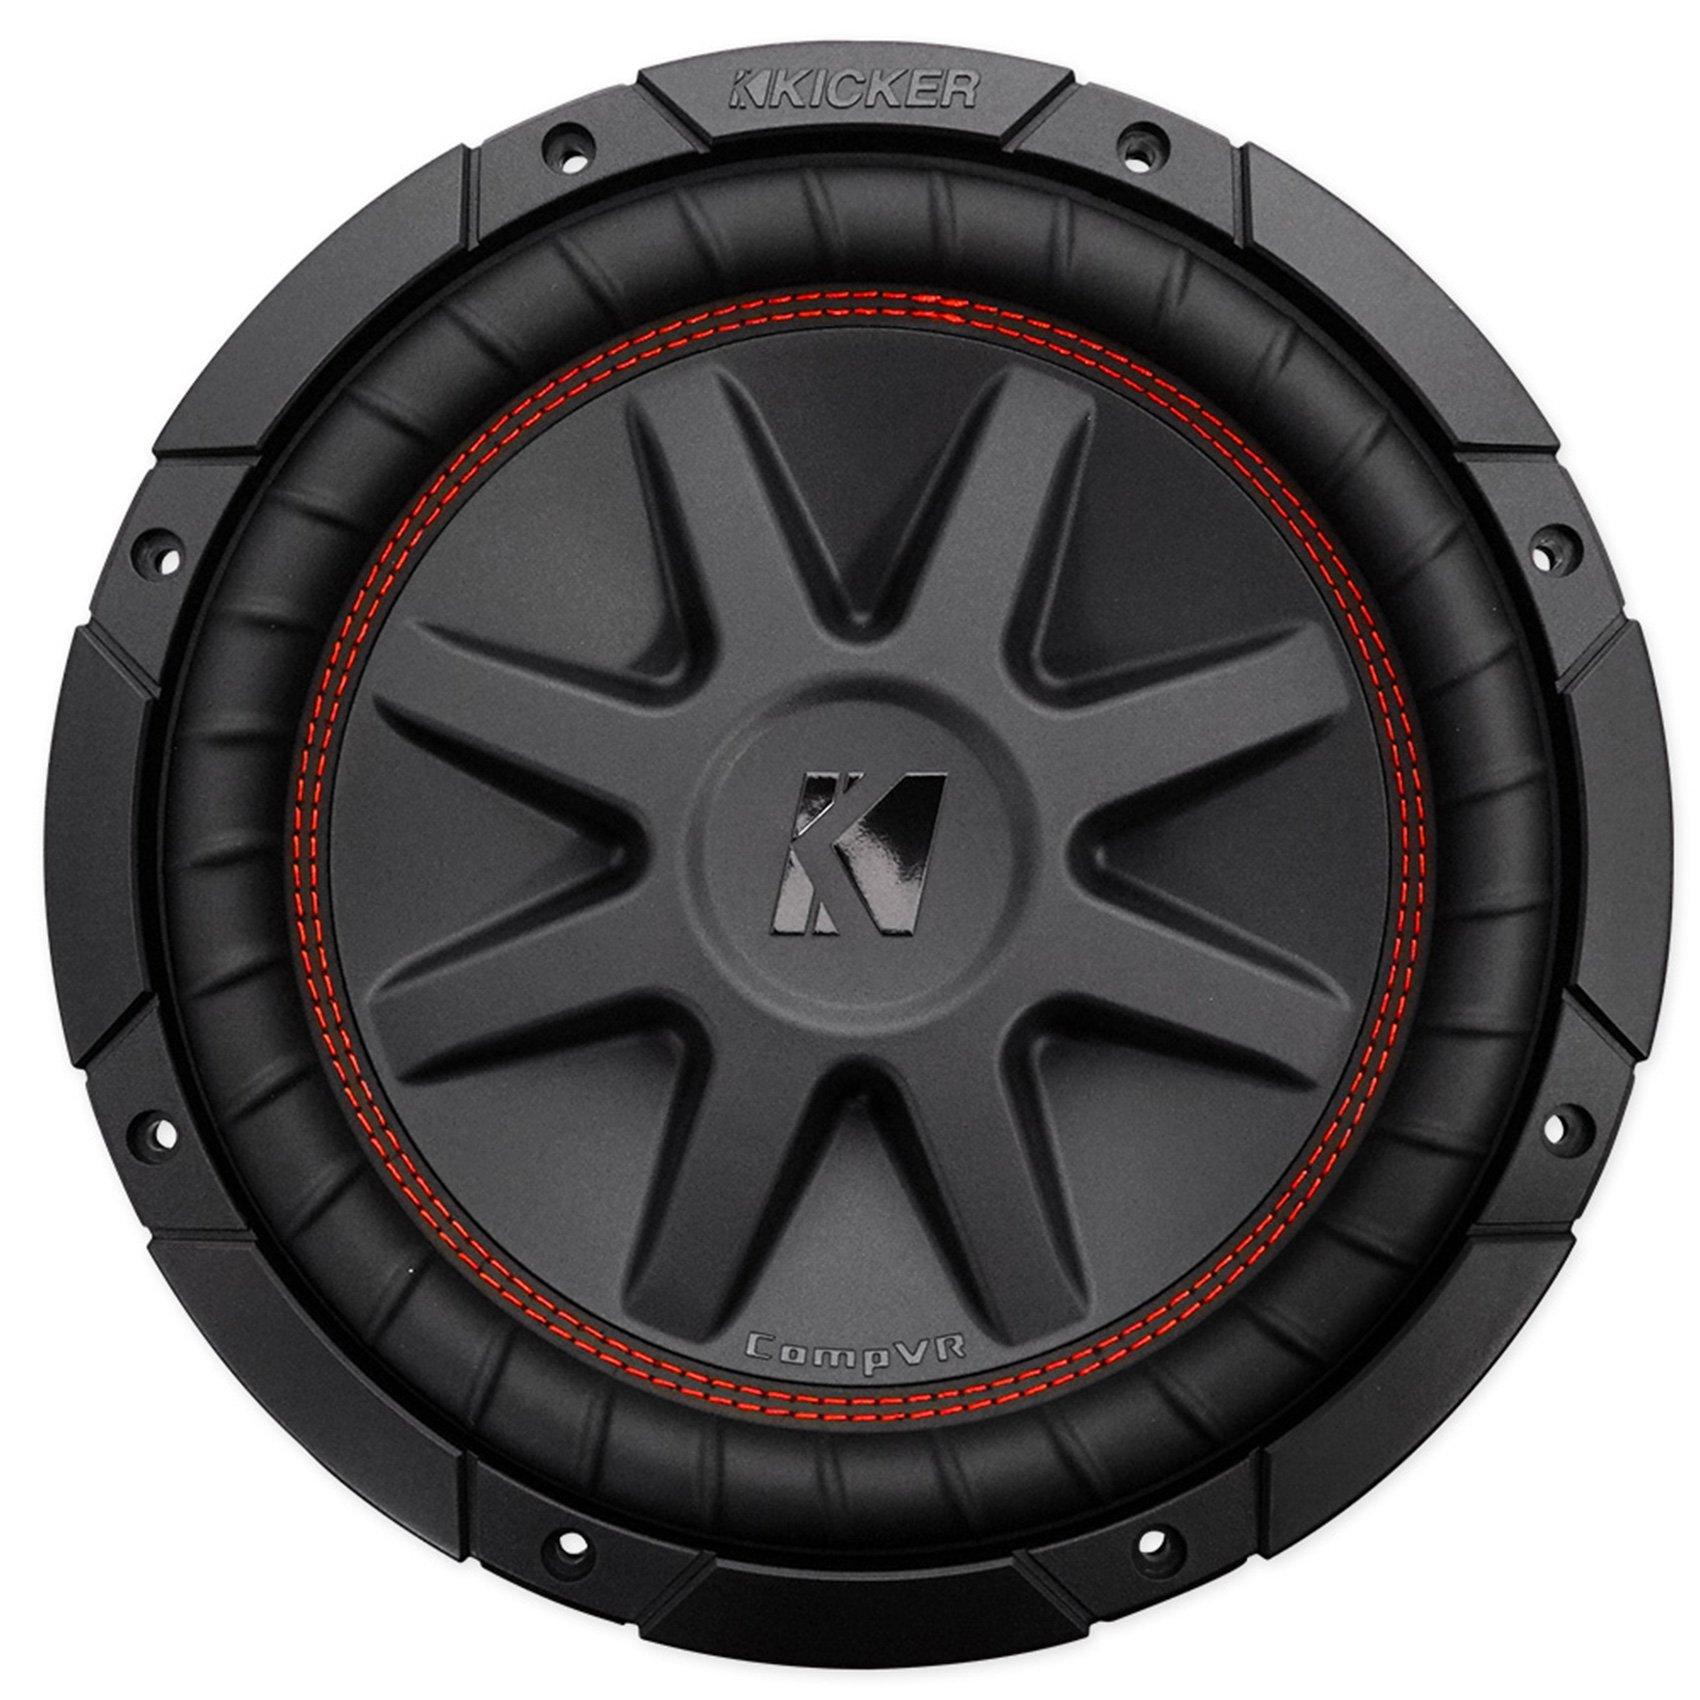 (2) Kicker 43CVR102 10'' Dual Voice Coil 2-Ohm Car Subwoofers Totaling 1600 Watt Peak/800 Watt RMS